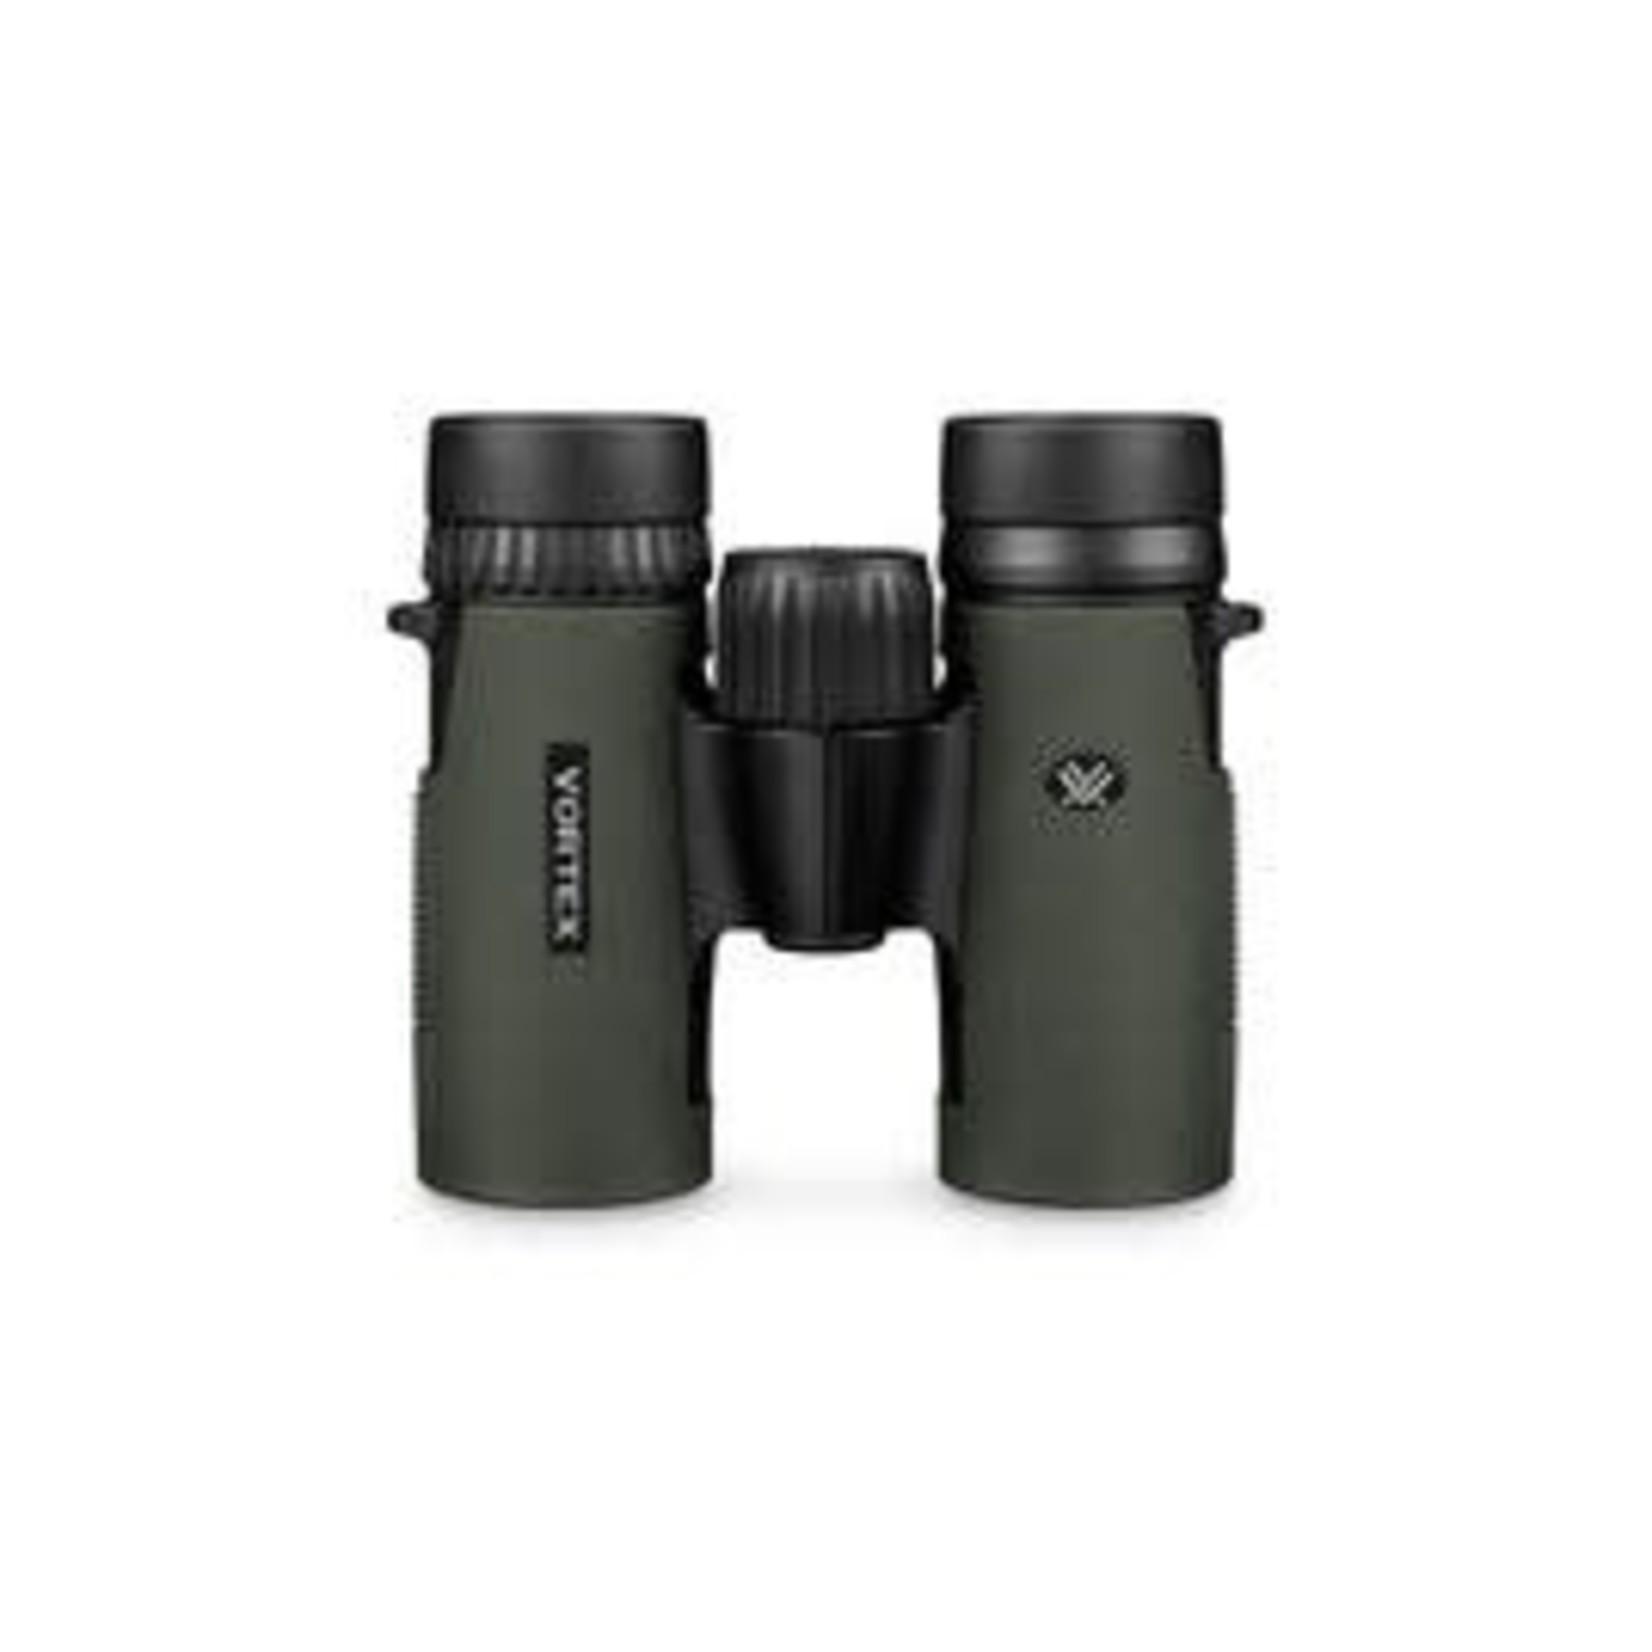 Vortex Vortex Diamondback HD 8x32 Binoculars